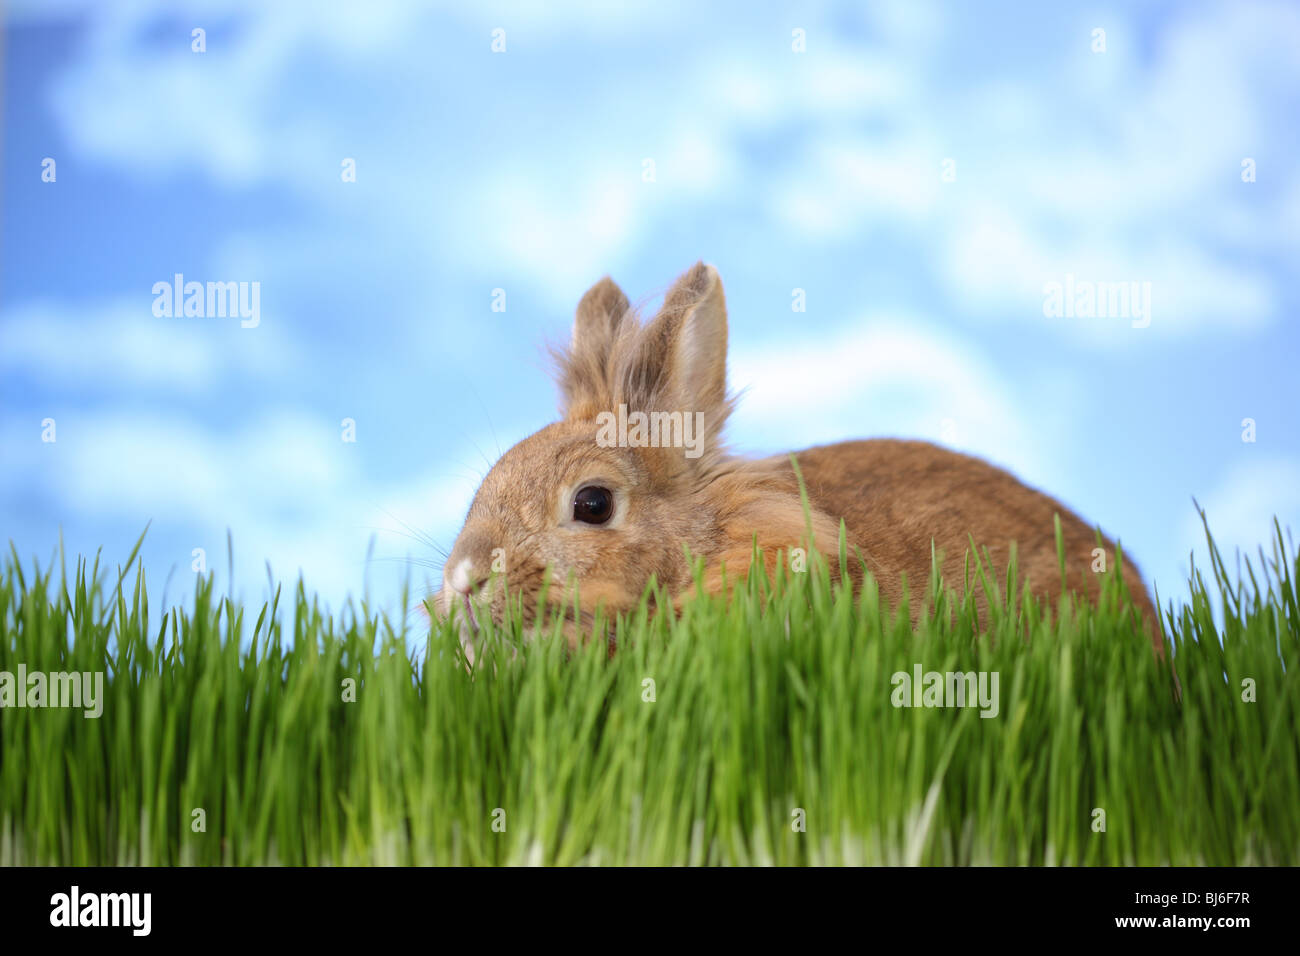 Rabbit in grass - Stock Image